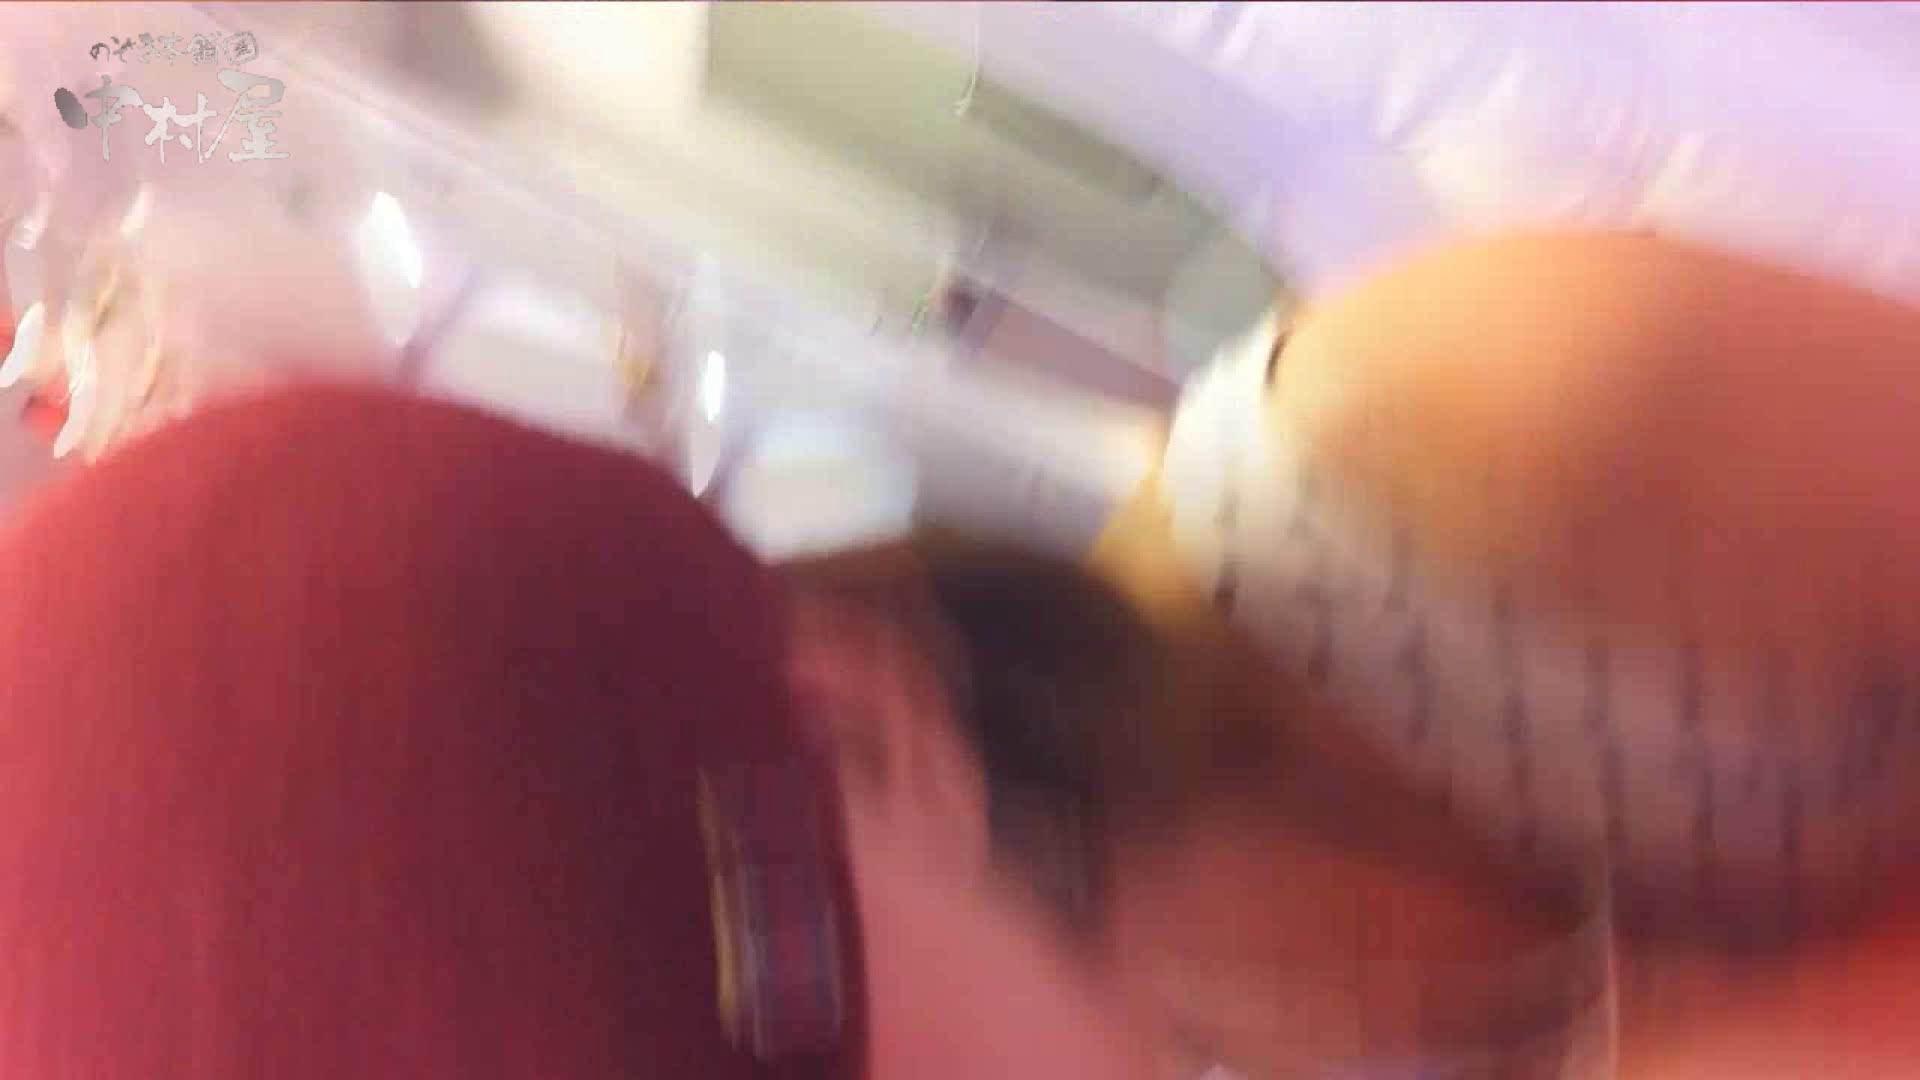 vol.70 美人アパレル胸チラ&パンチラ ベレー店員さんの下着 OLエロ画像 盗撮われめAV動画紹介 90PICs 2